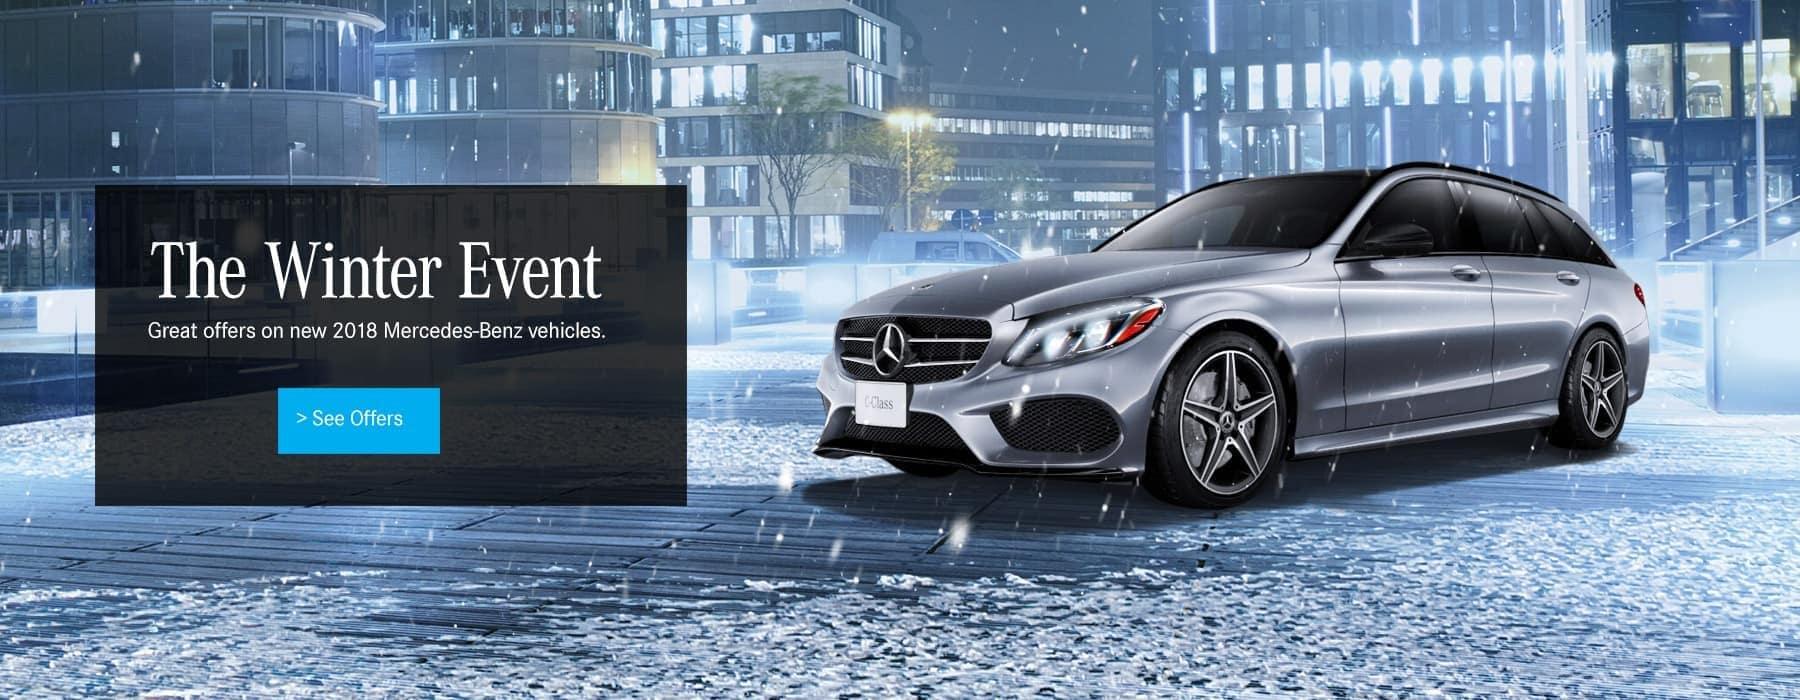 Mercedes benz downtown toronto mercedes benz dealership for Mercedes benz winter event commercial